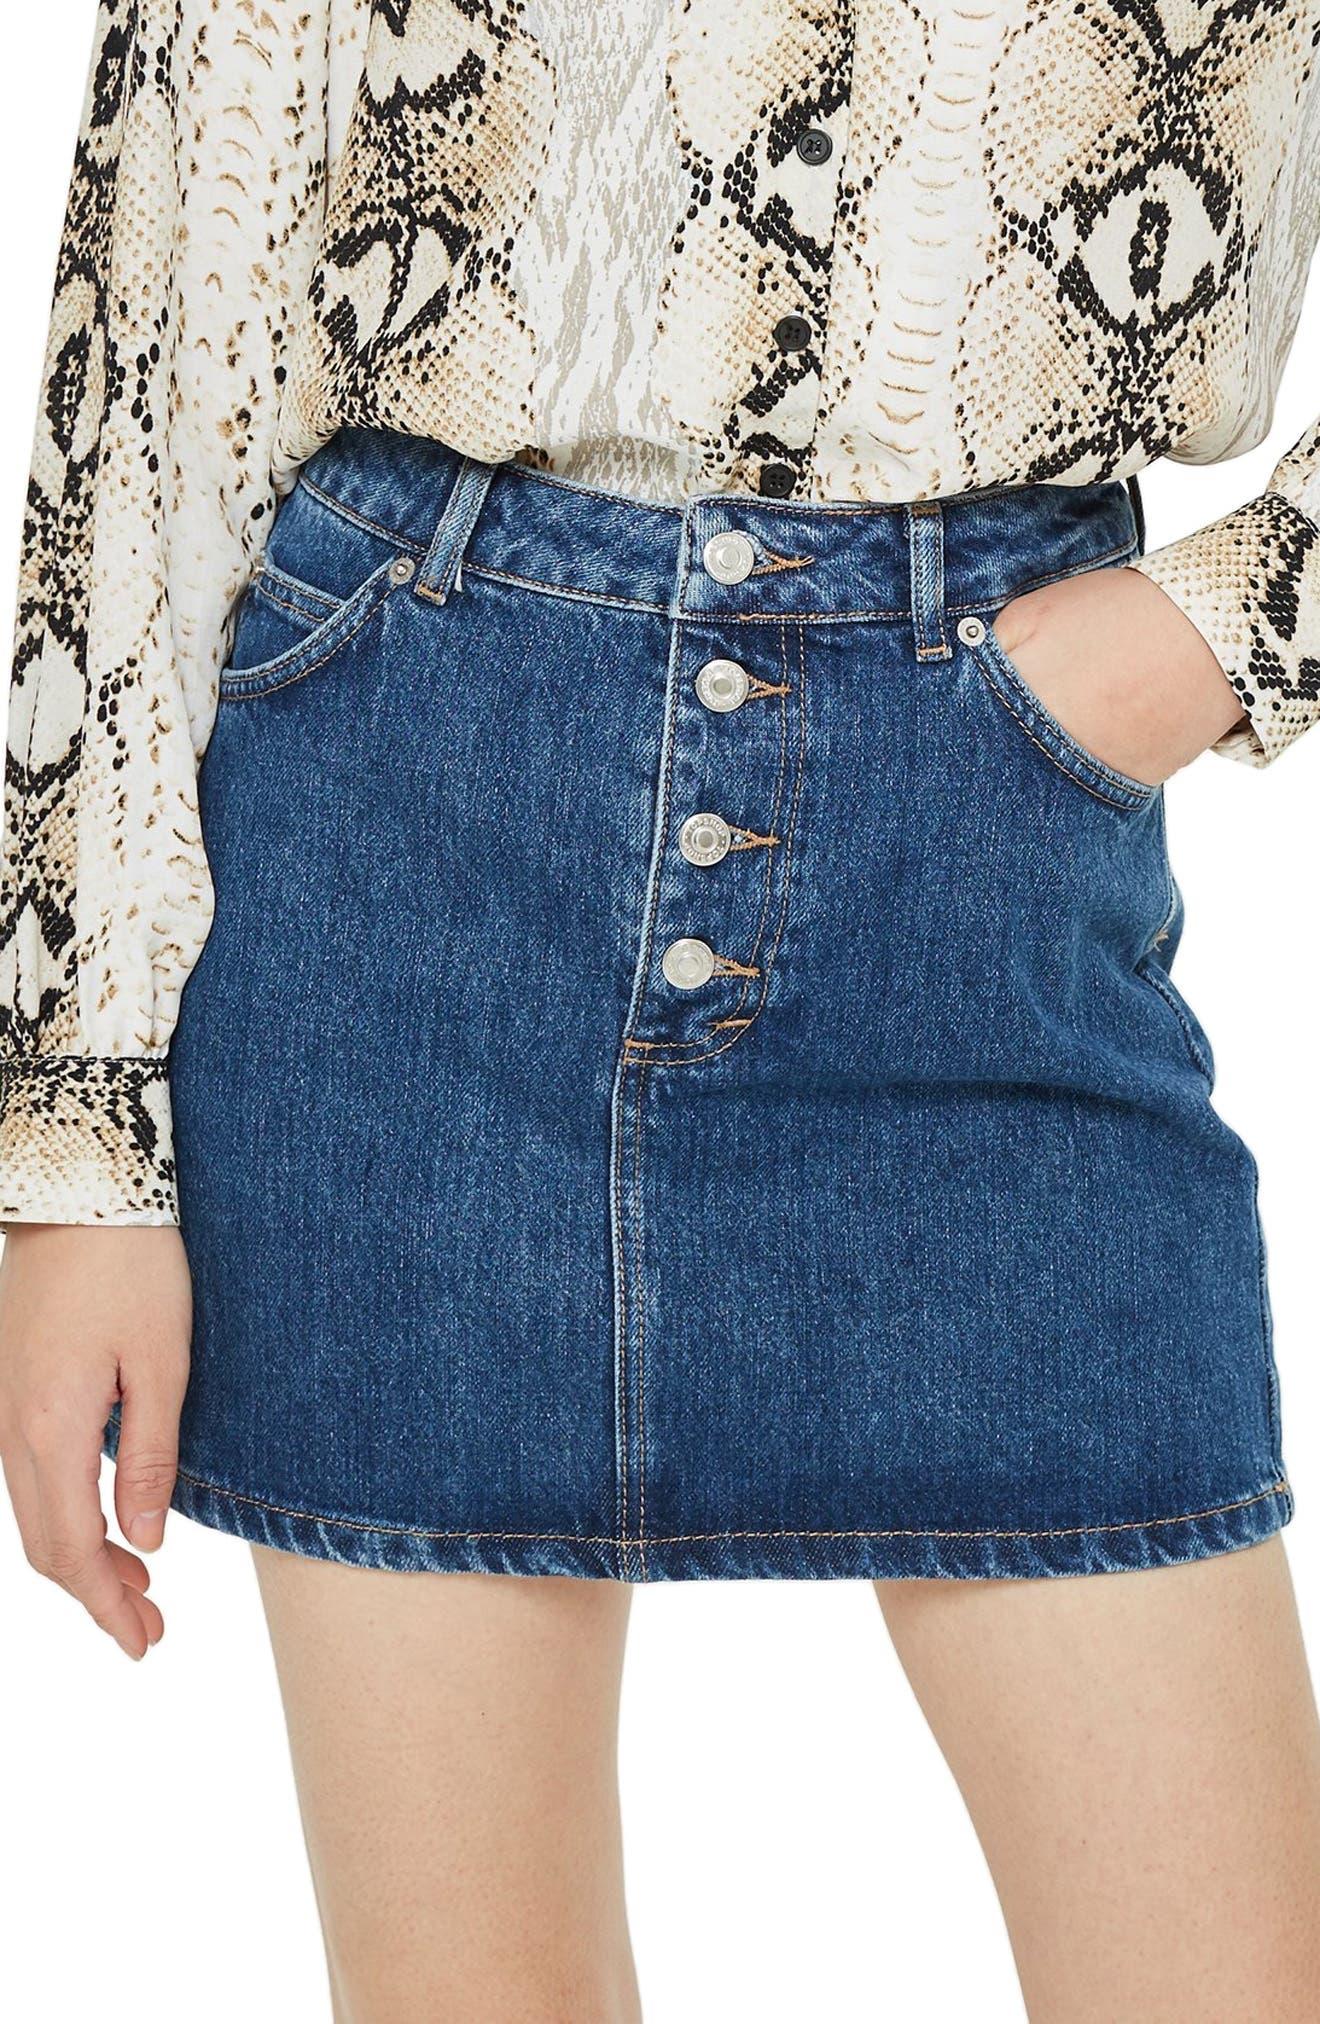 Button Fly Denim Skirt,                             Main thumbnail 1, color,                             MID DENIM